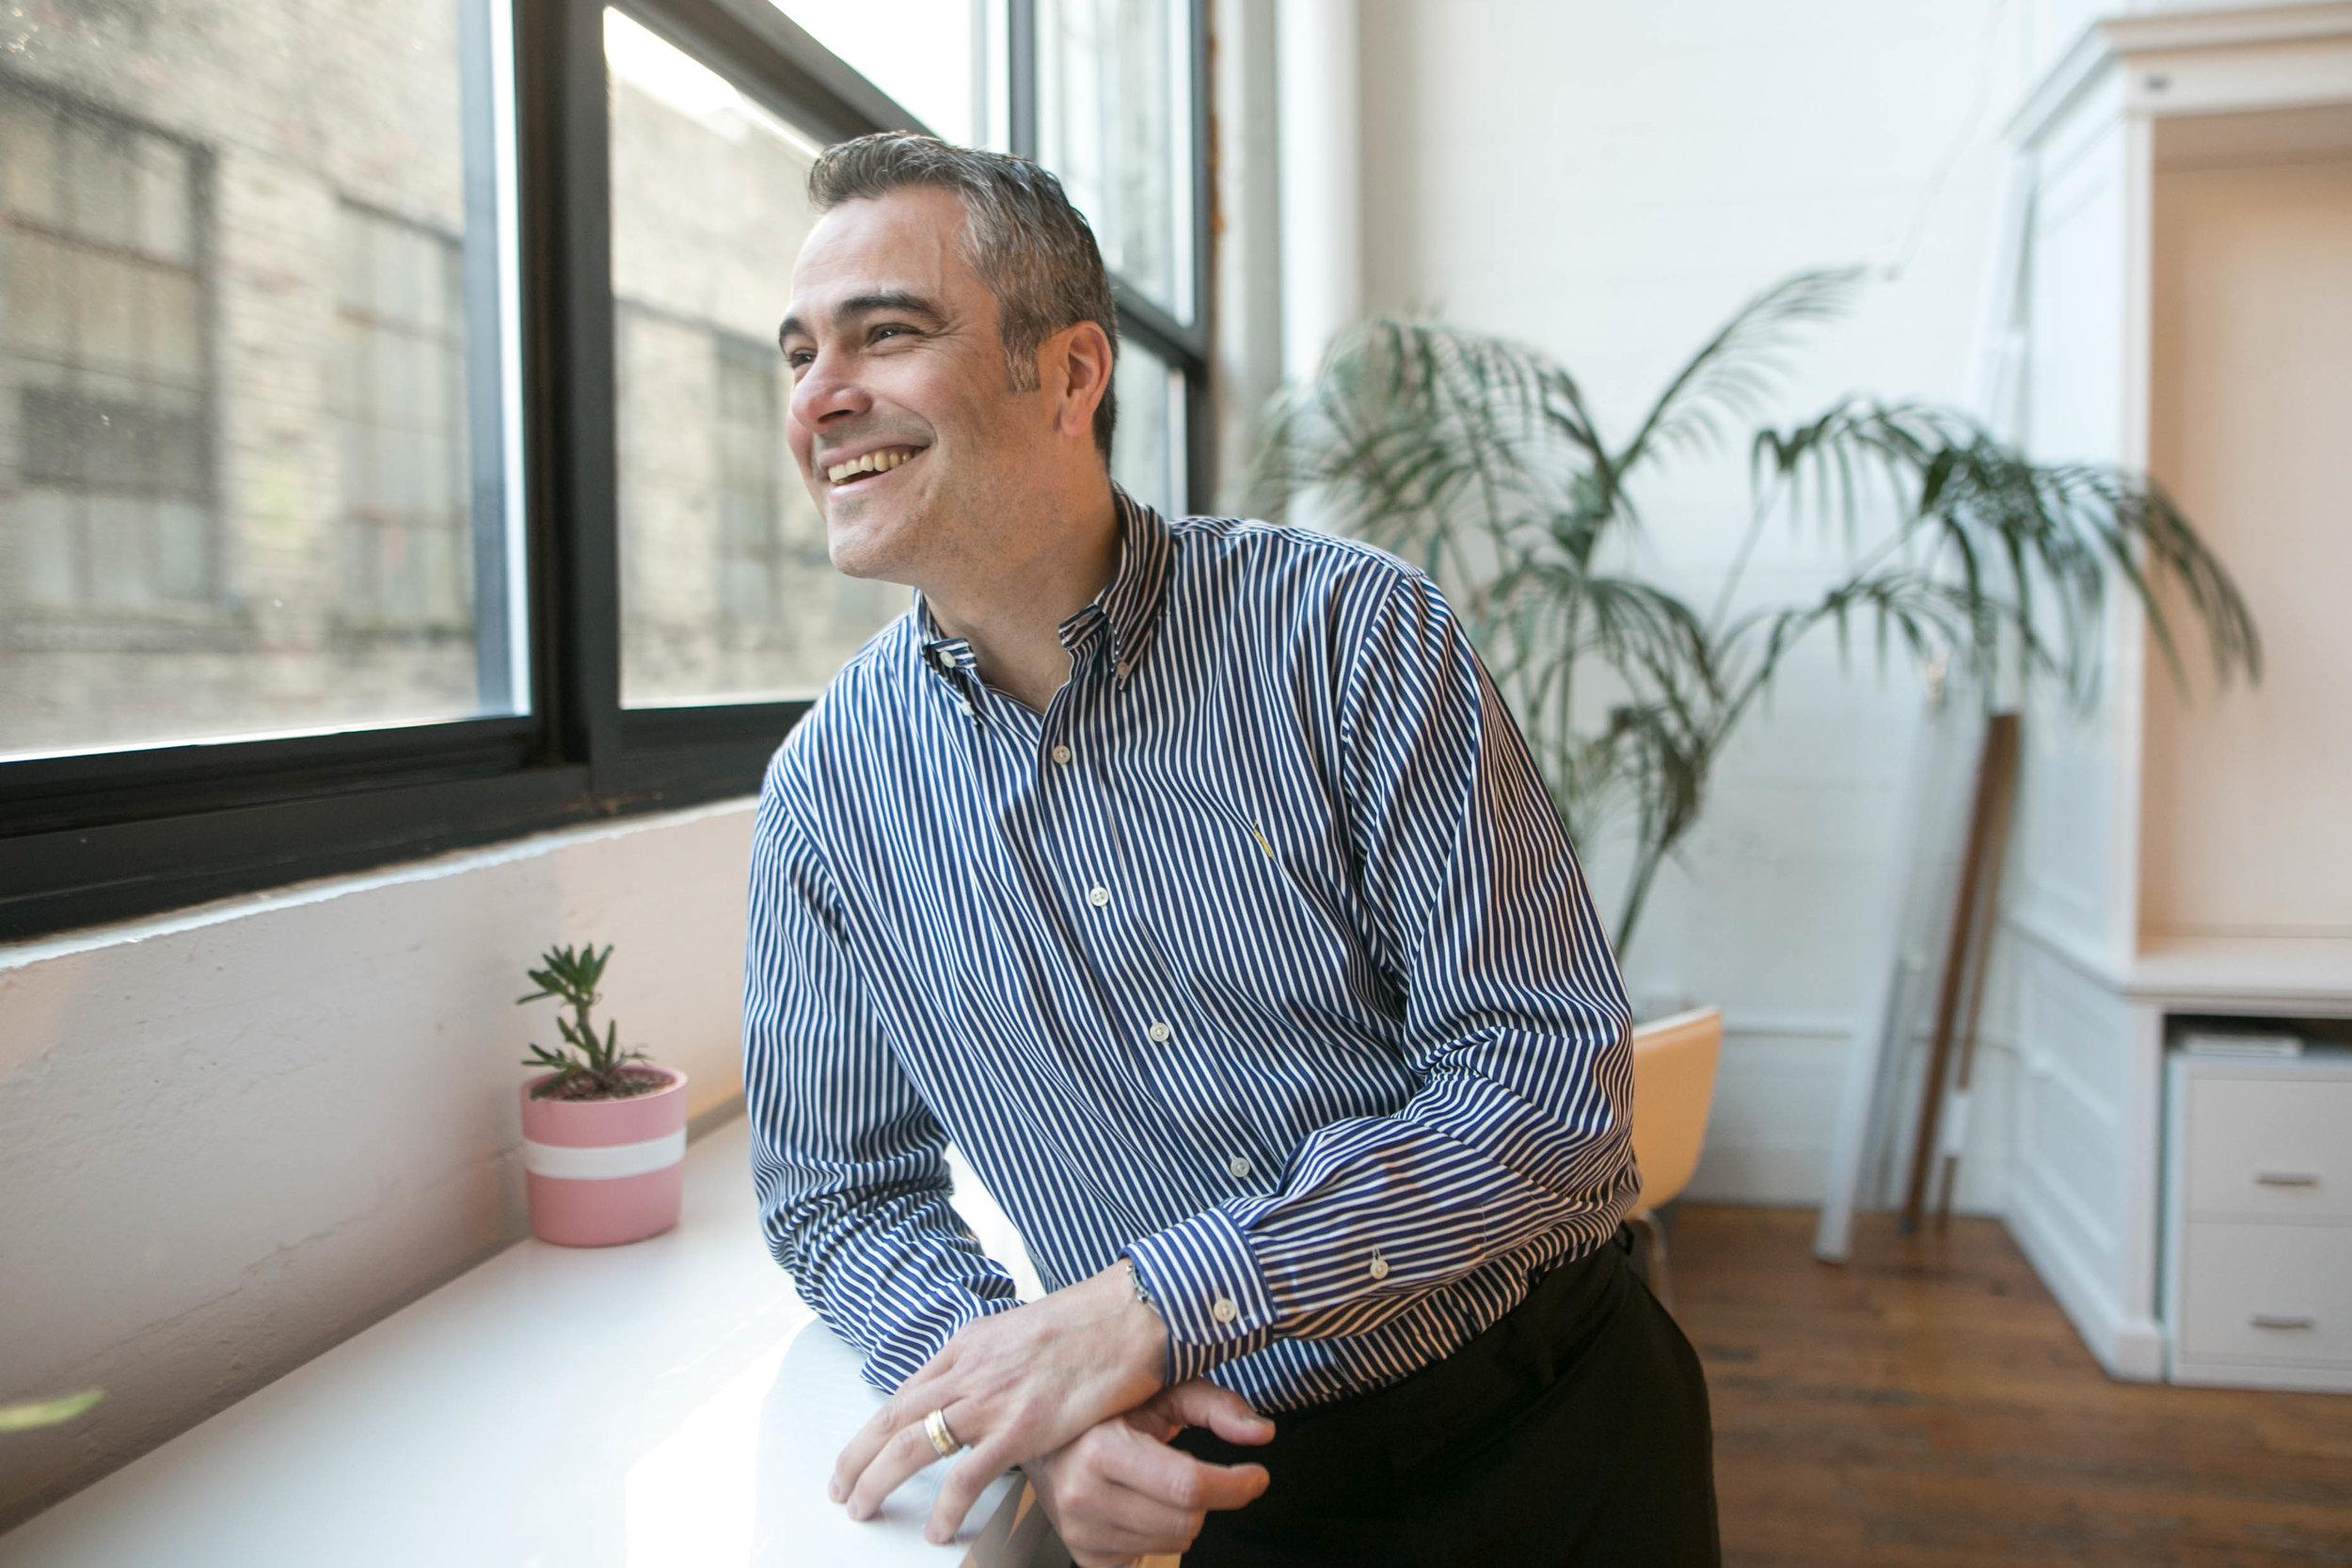 David Valadez, Head of Operations at The Riveter.